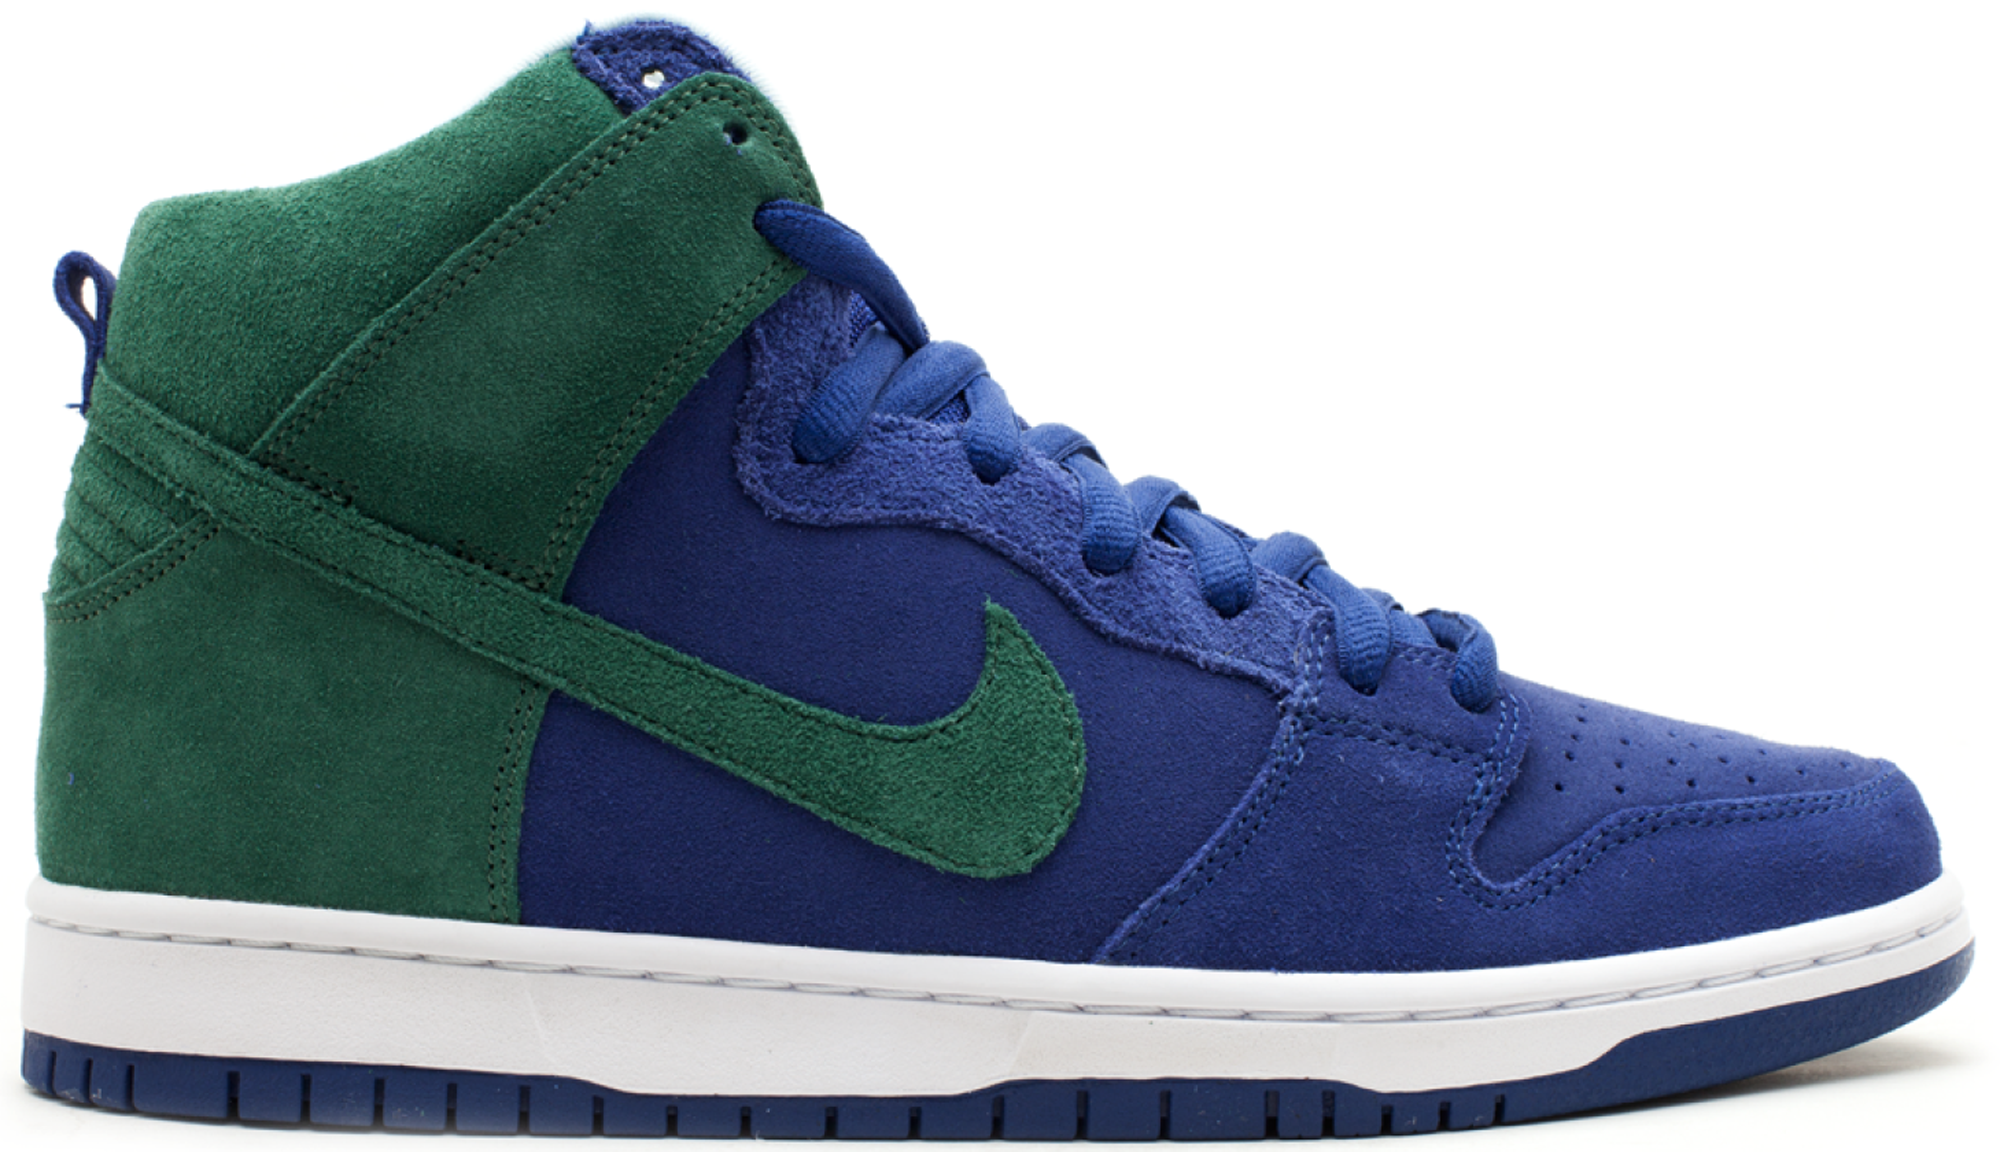 Nike SB Dunk High Deep Royal Noble Green